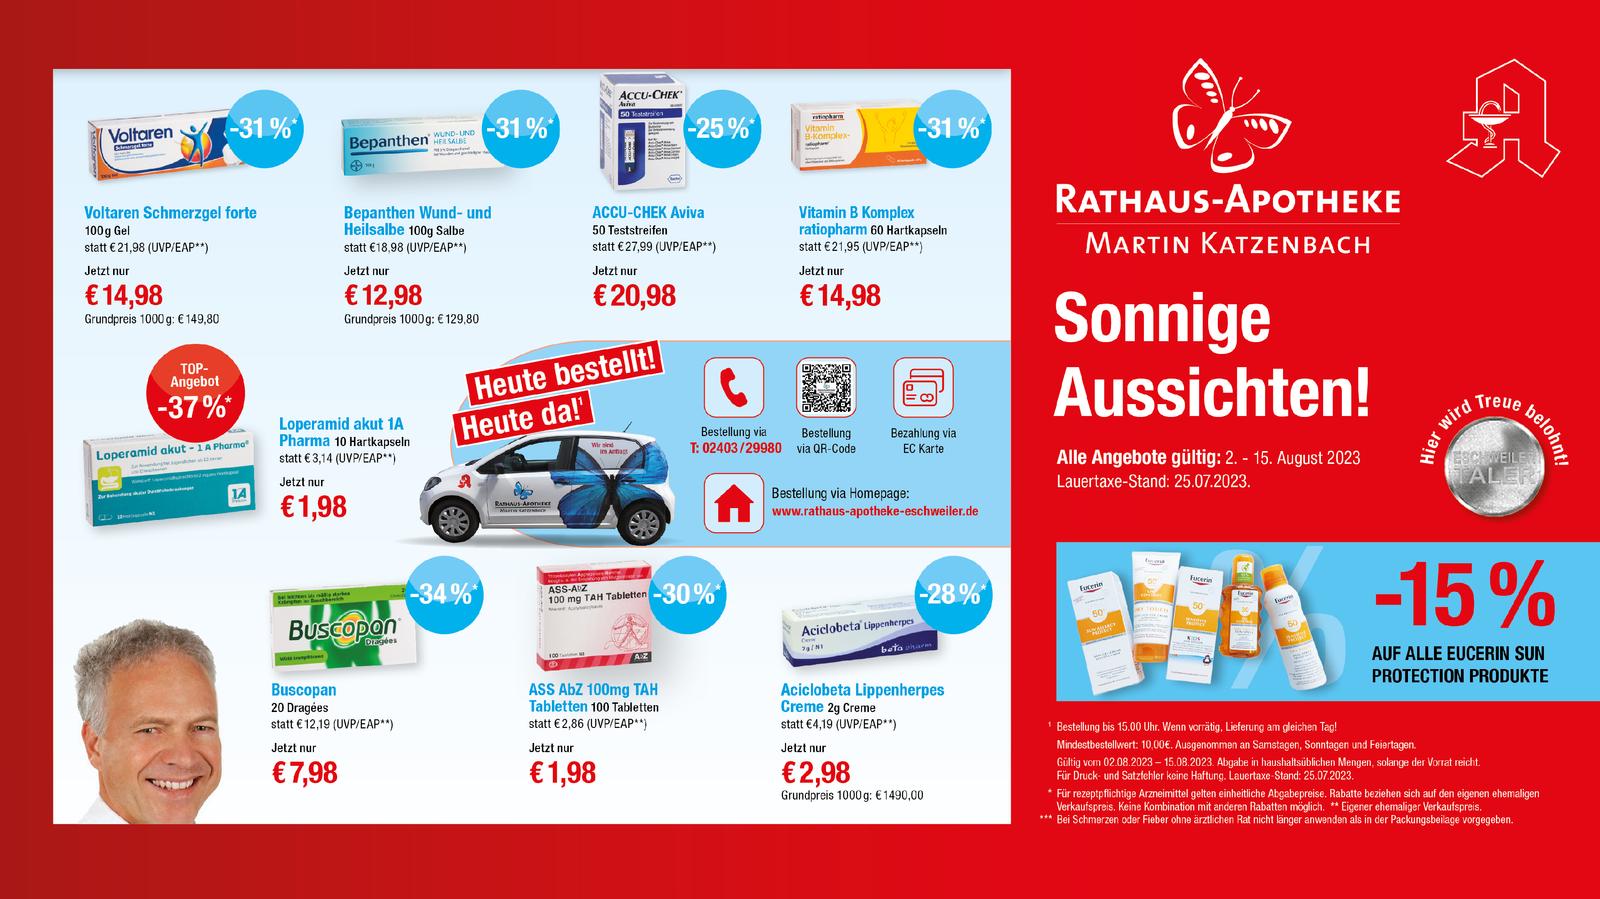 https://mein-uploads.apocdn.net/6263/leaflets/6263_flyer-Seite1.png